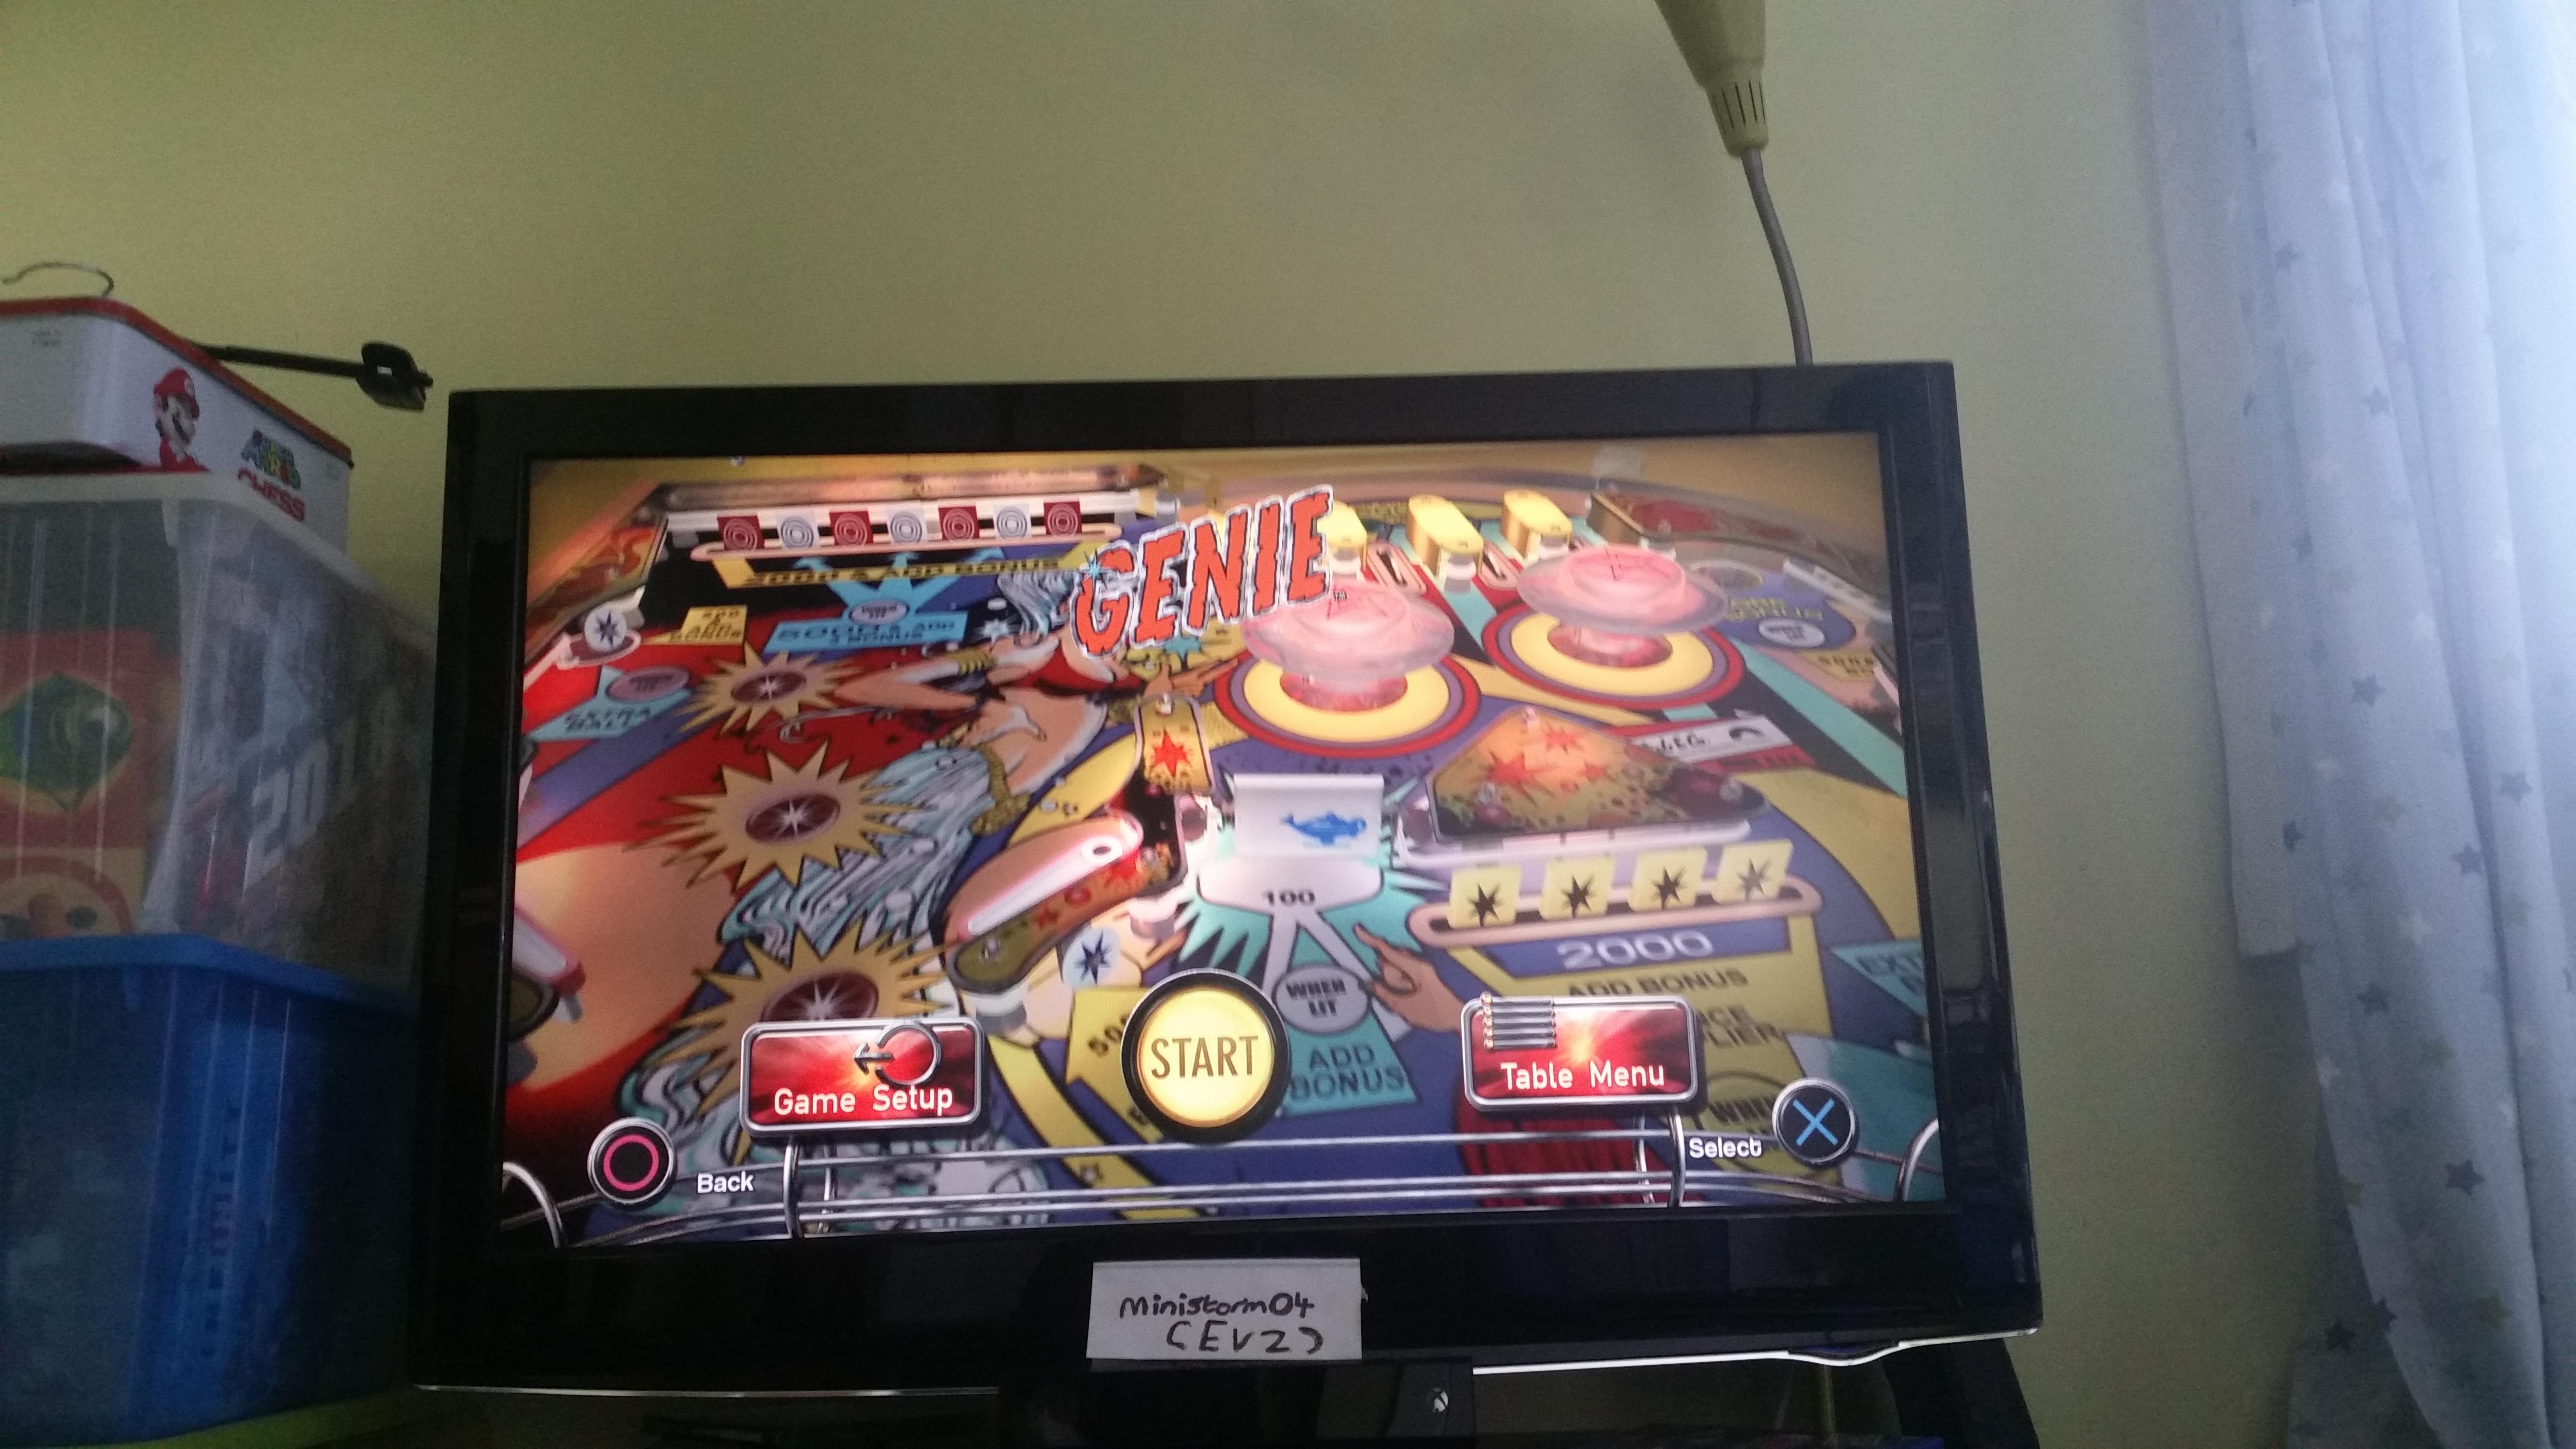 ministorm04: Pinball Arcade: Genie (Playstation 4) 216,490 points on 2019-06-03 11:13:47